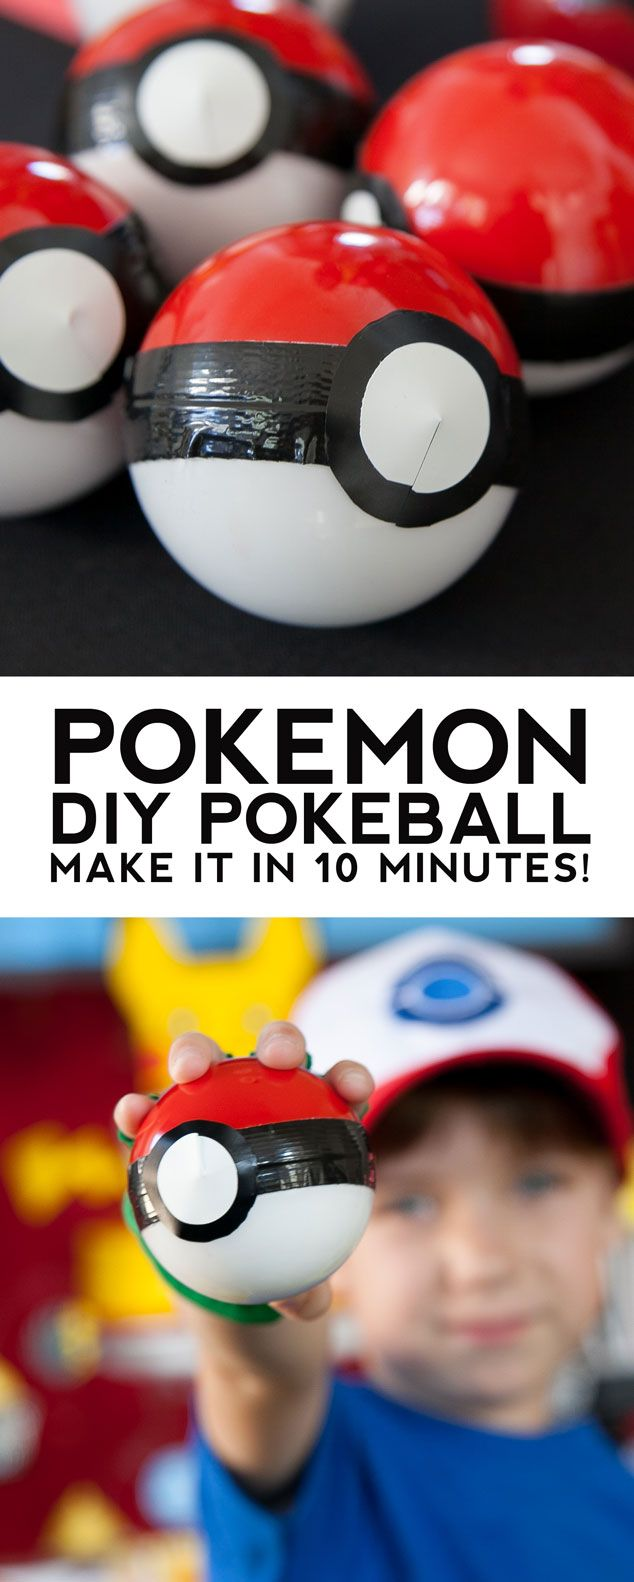 Pokeball Diy Pokemon Party Favor In Under 10 Minutes